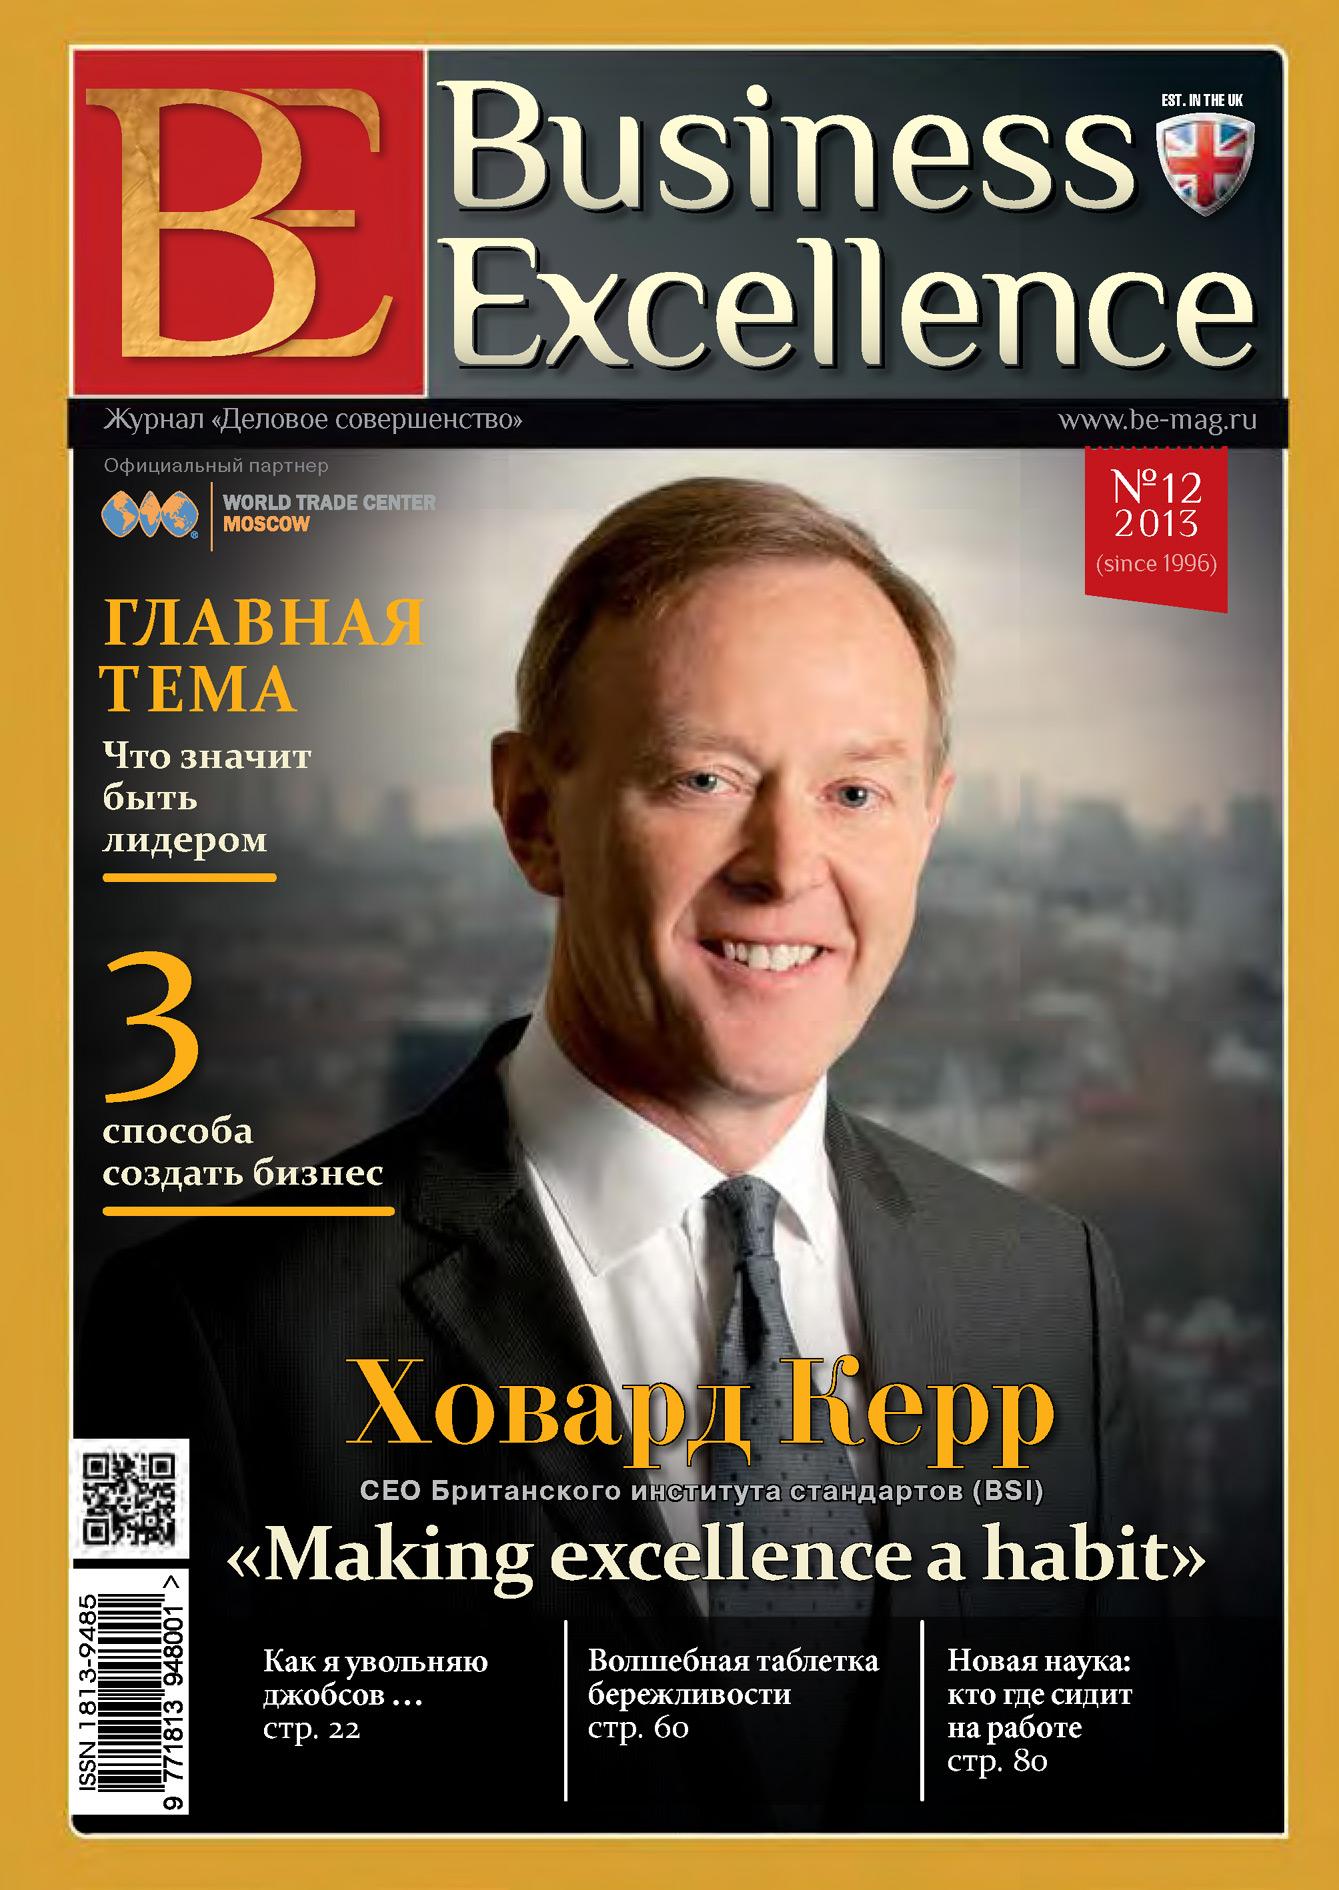 Фото - Отсутствует Business Excellence (Деловое совершенство) № 12 (186) 2013 отсутствует деловое совершенство 12 2008